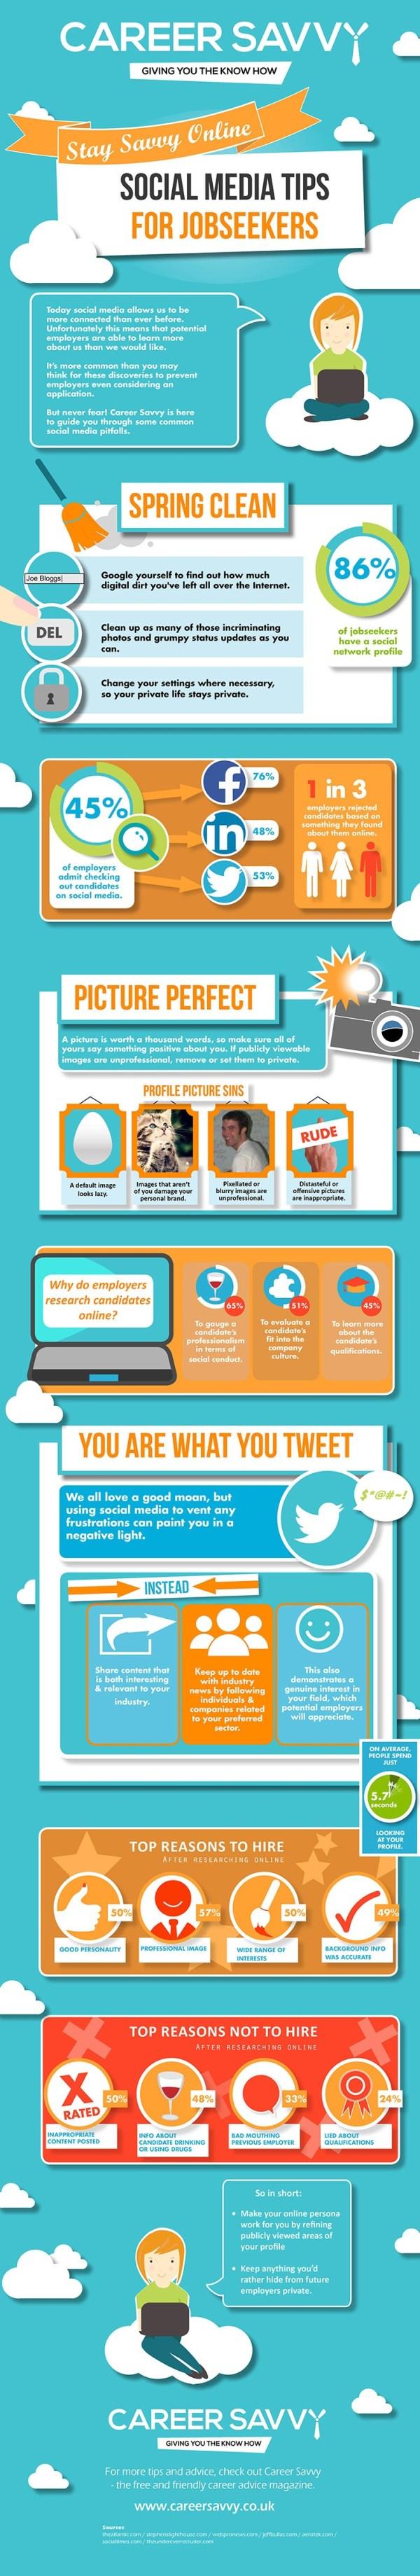 jobseeker digital footprint